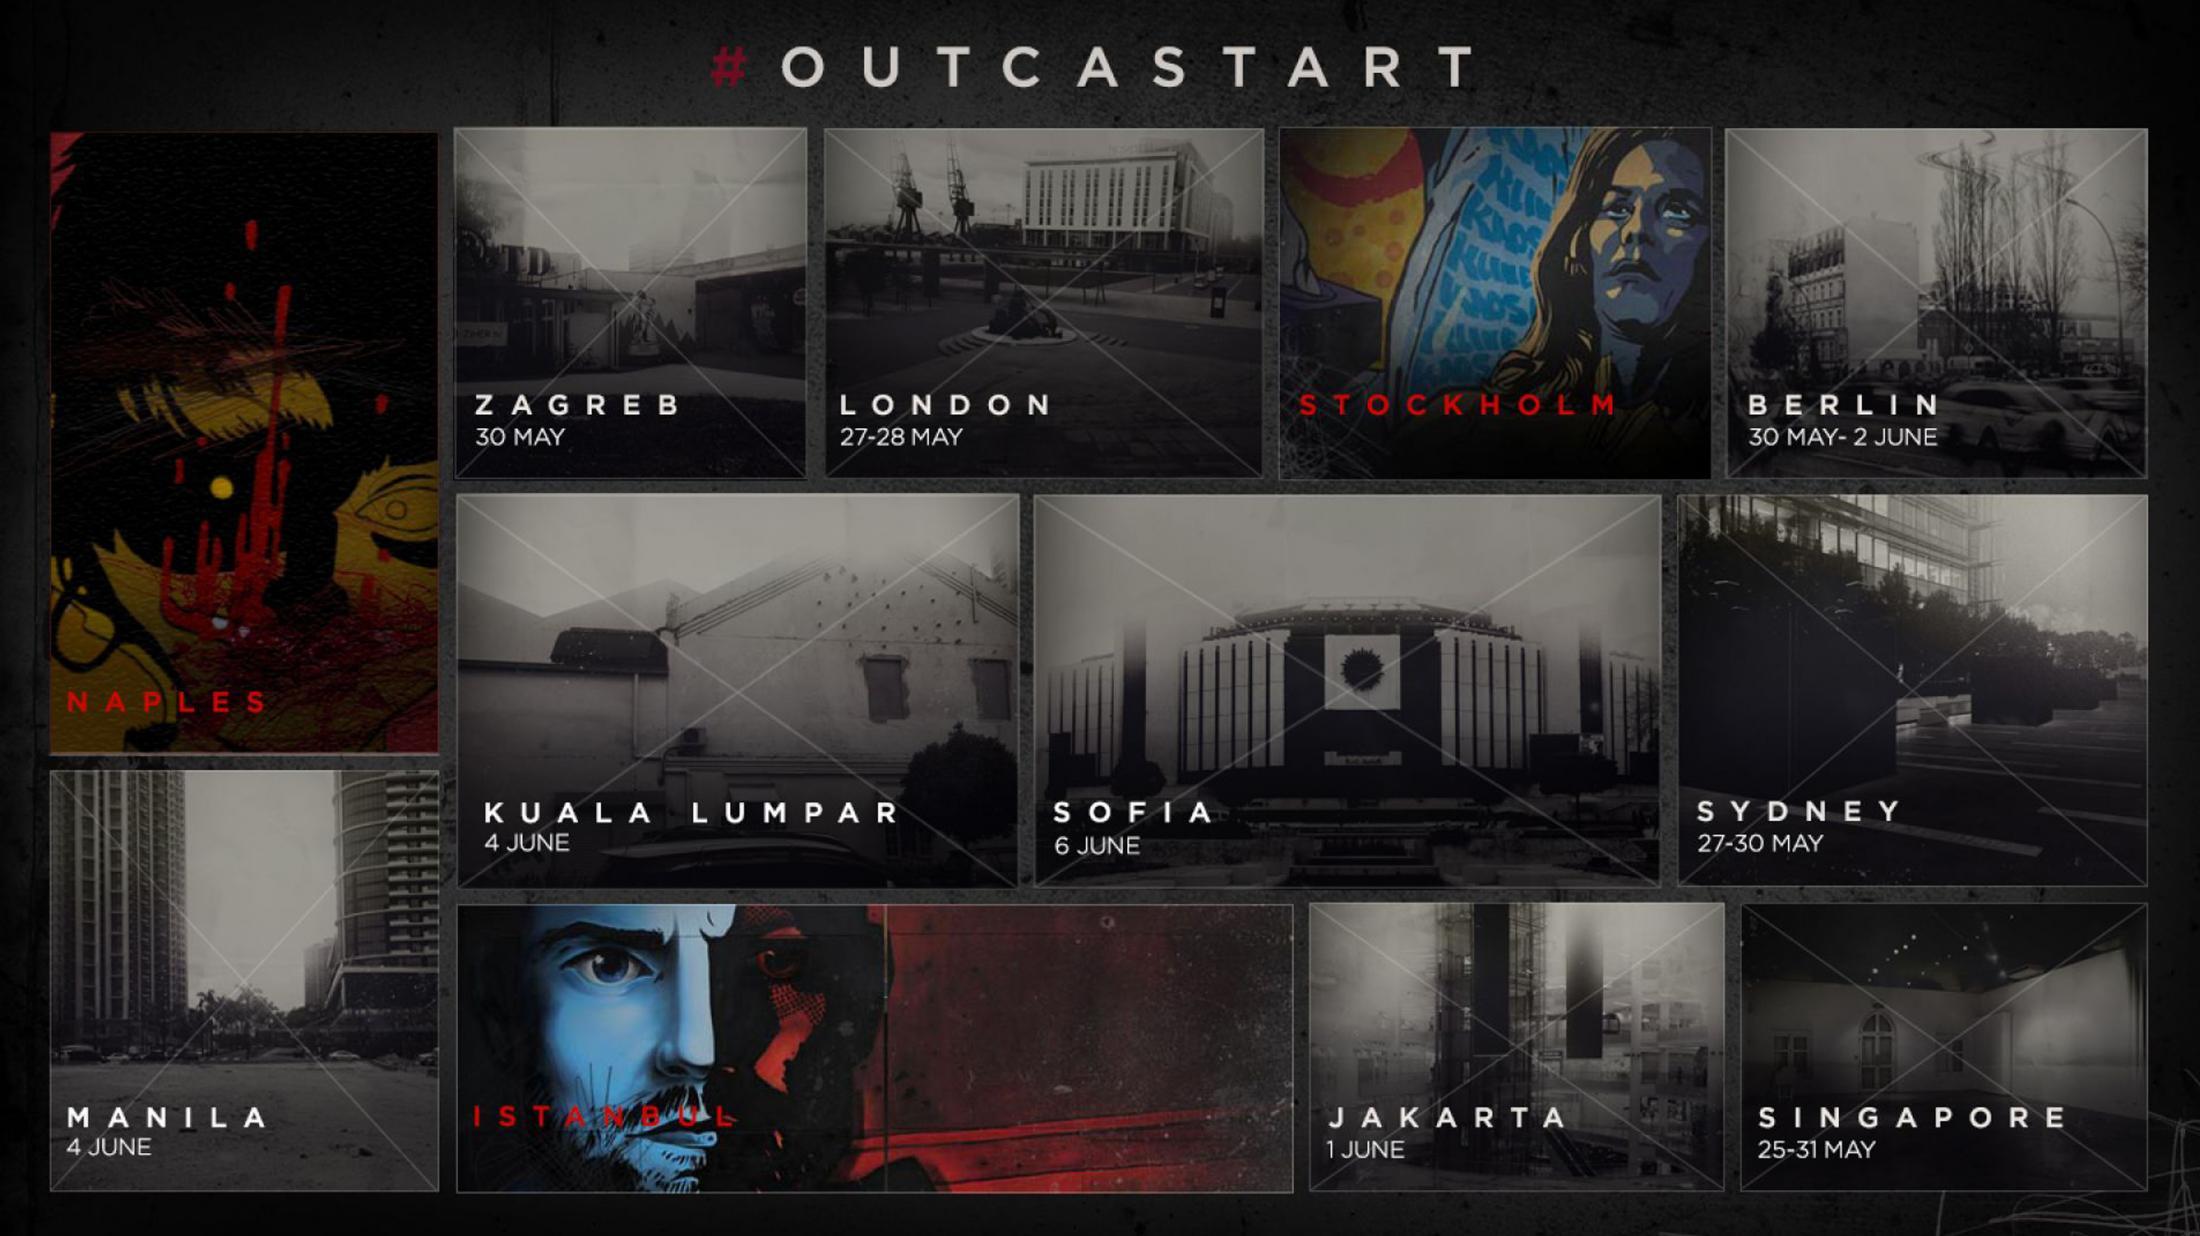 Thumbnail for Outcast Art